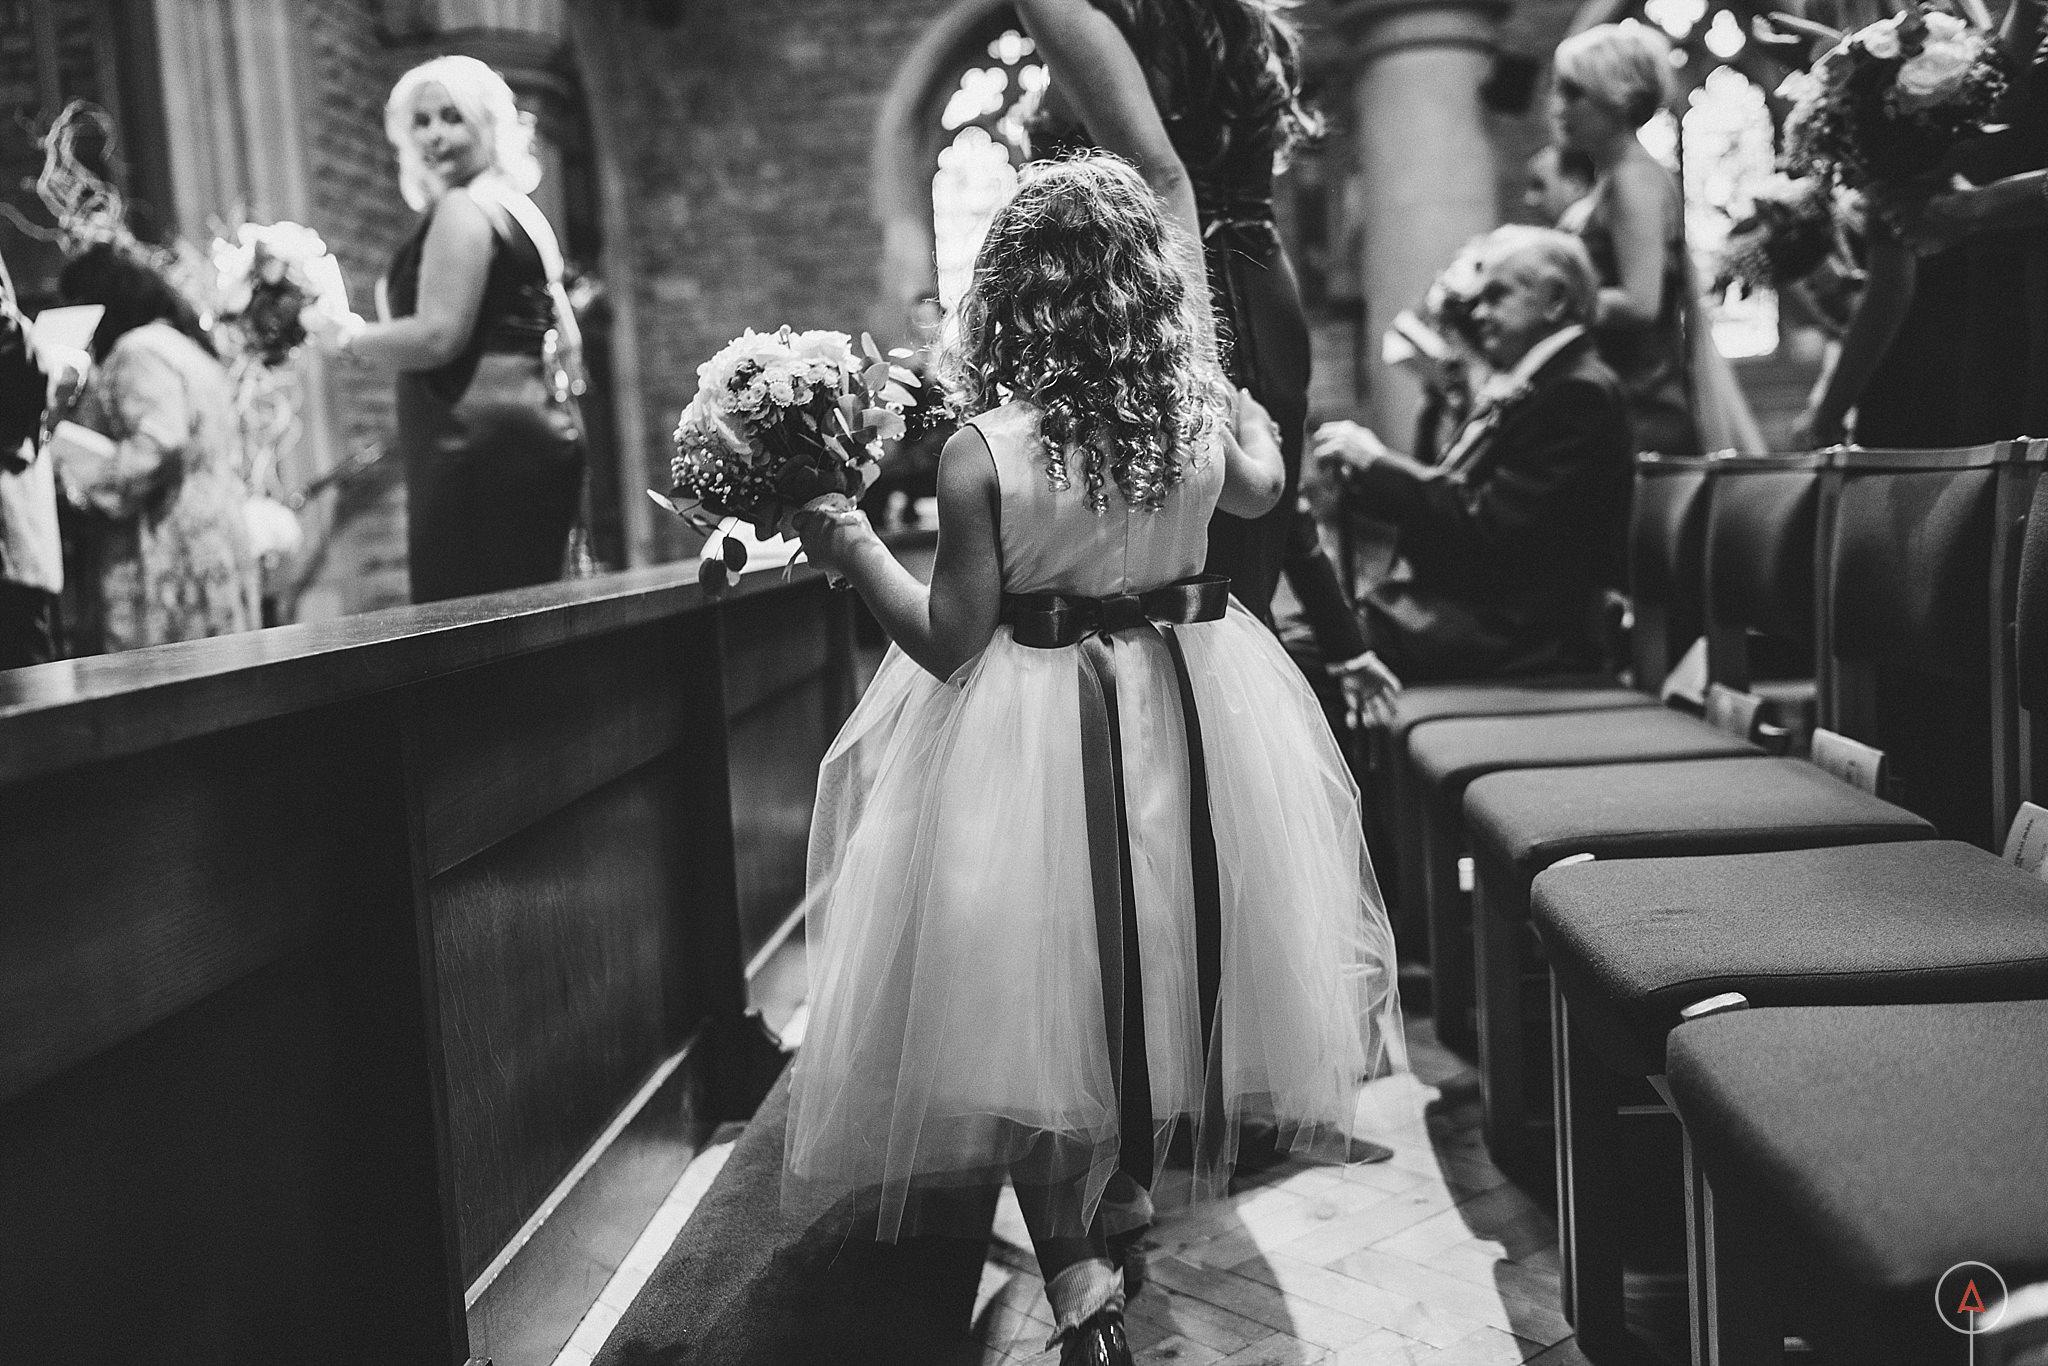 cardiff-wedding-photographer-aga-tomaszek_0367